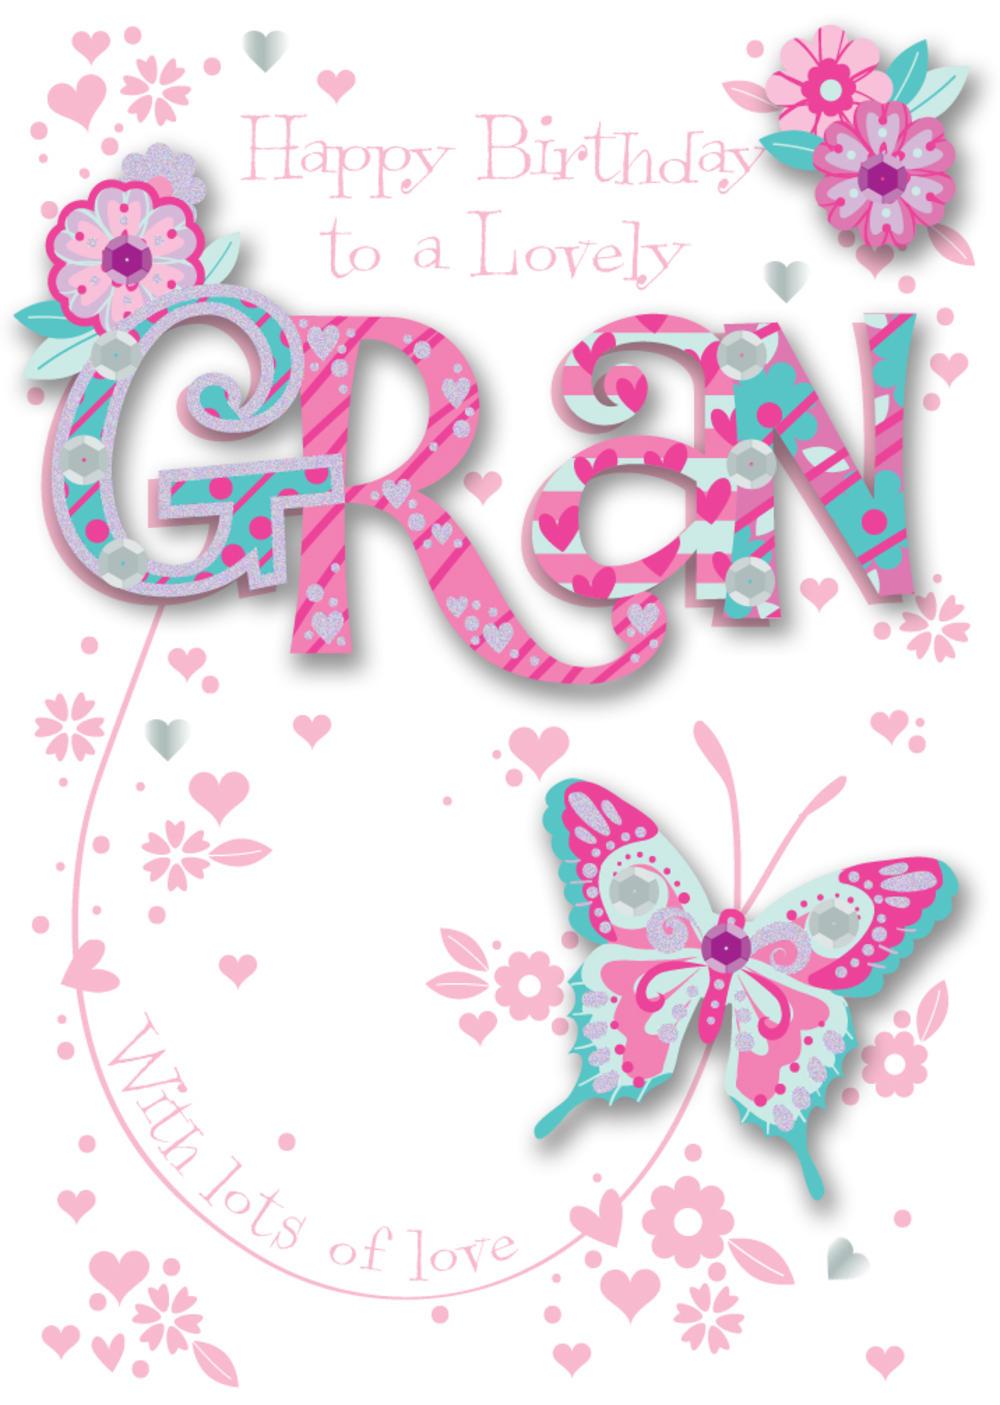 Gran Birthday Embellished Greeting Card